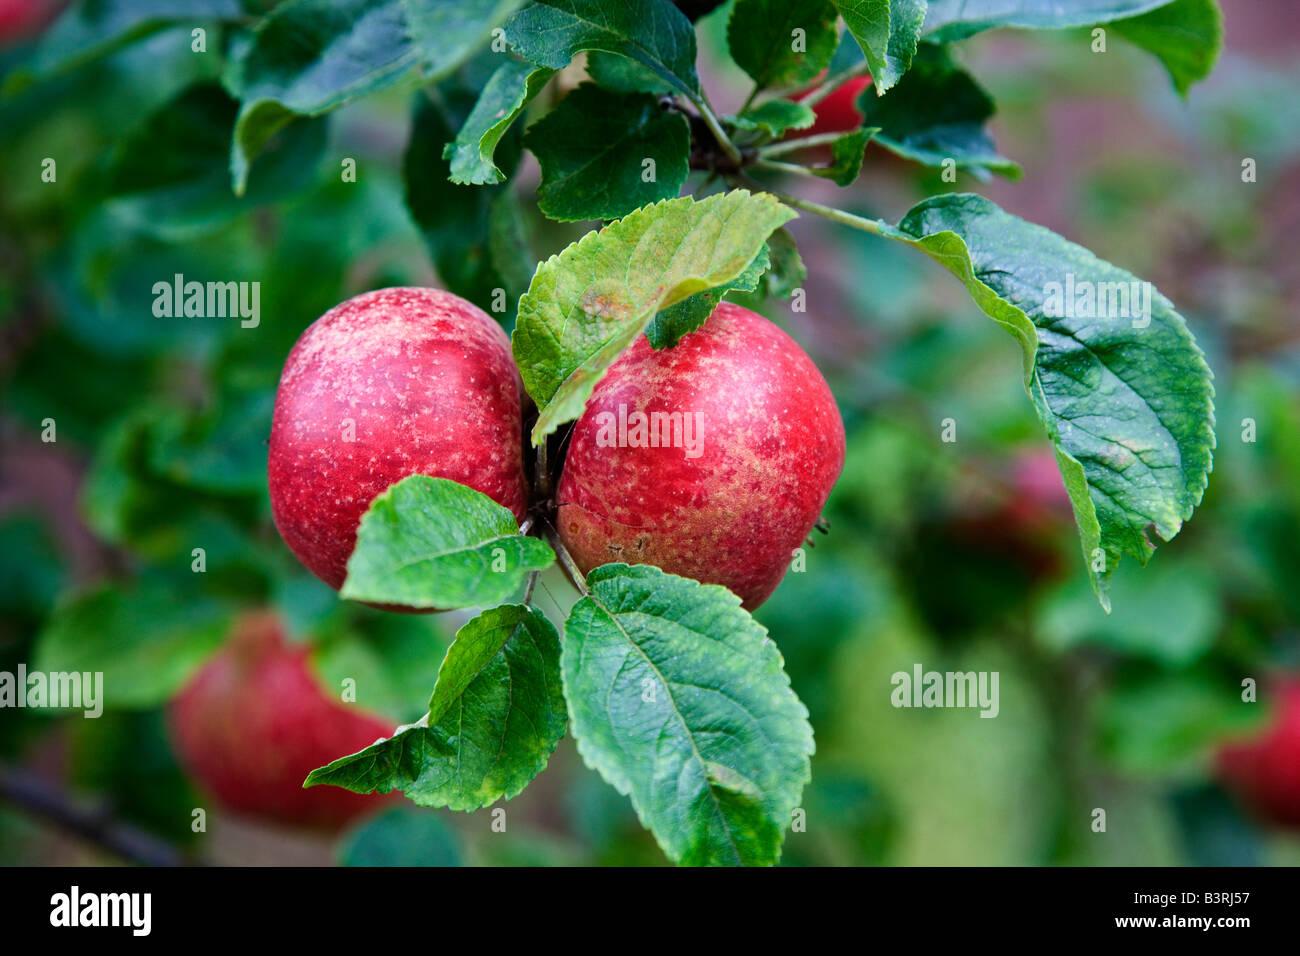 Diseased eating apples on tree - Stock Image